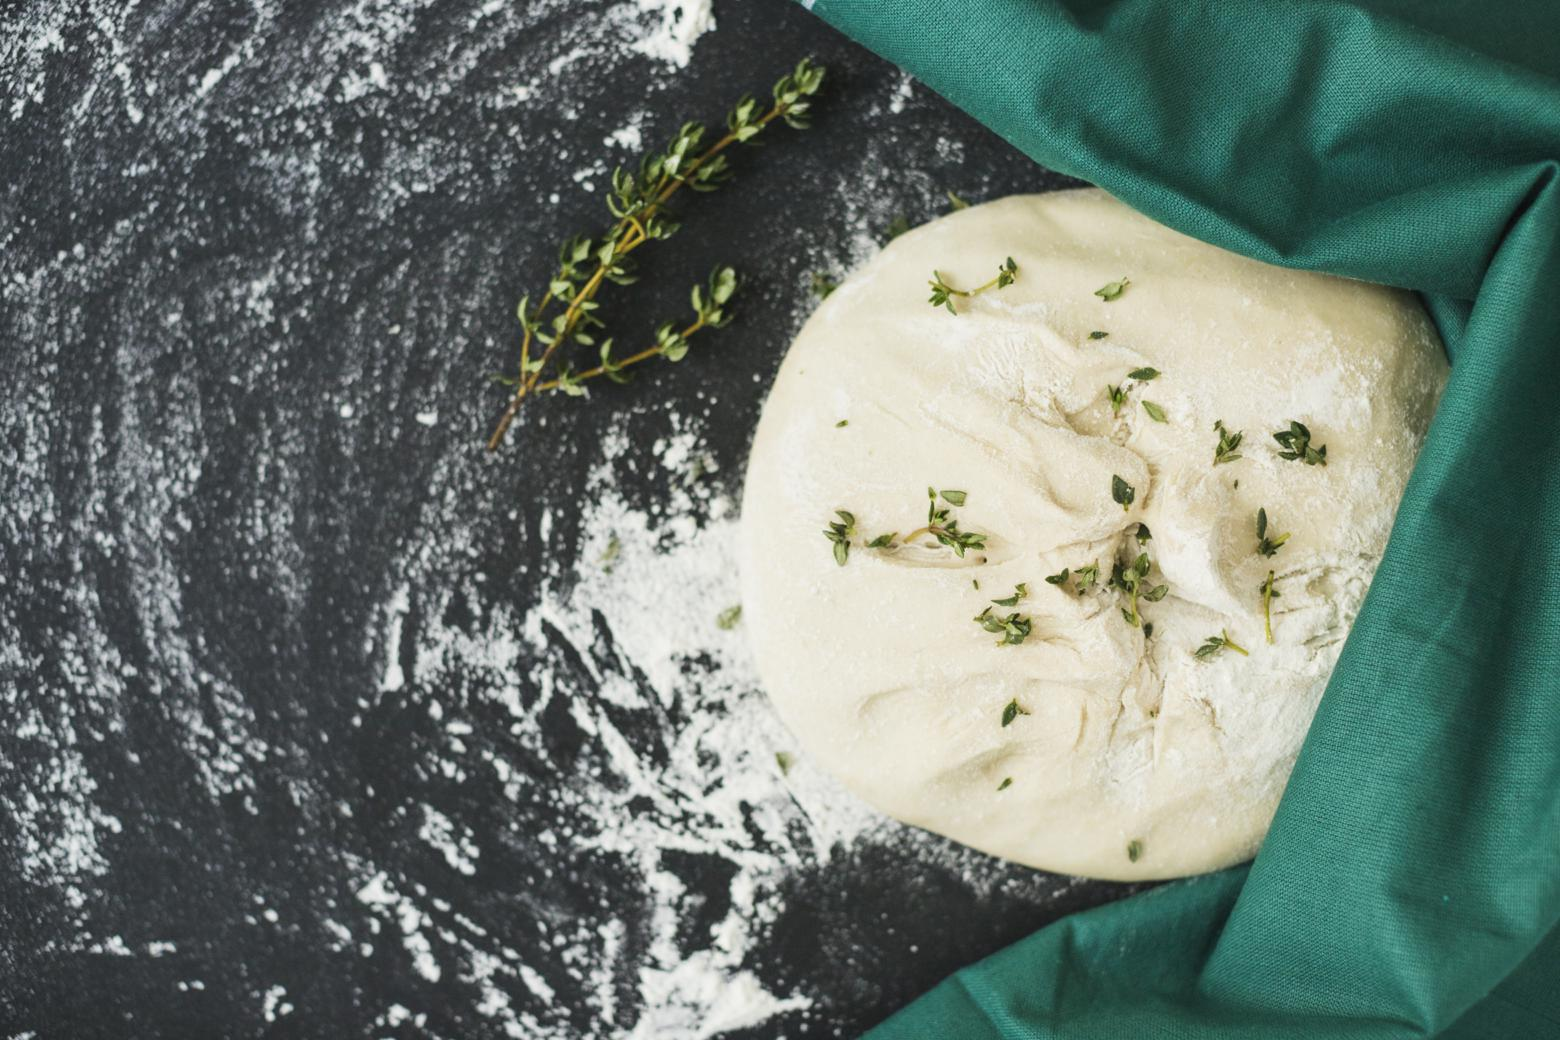 ricetta spianatine timo limone e formaggio - Natyoure - www.natyoure.it